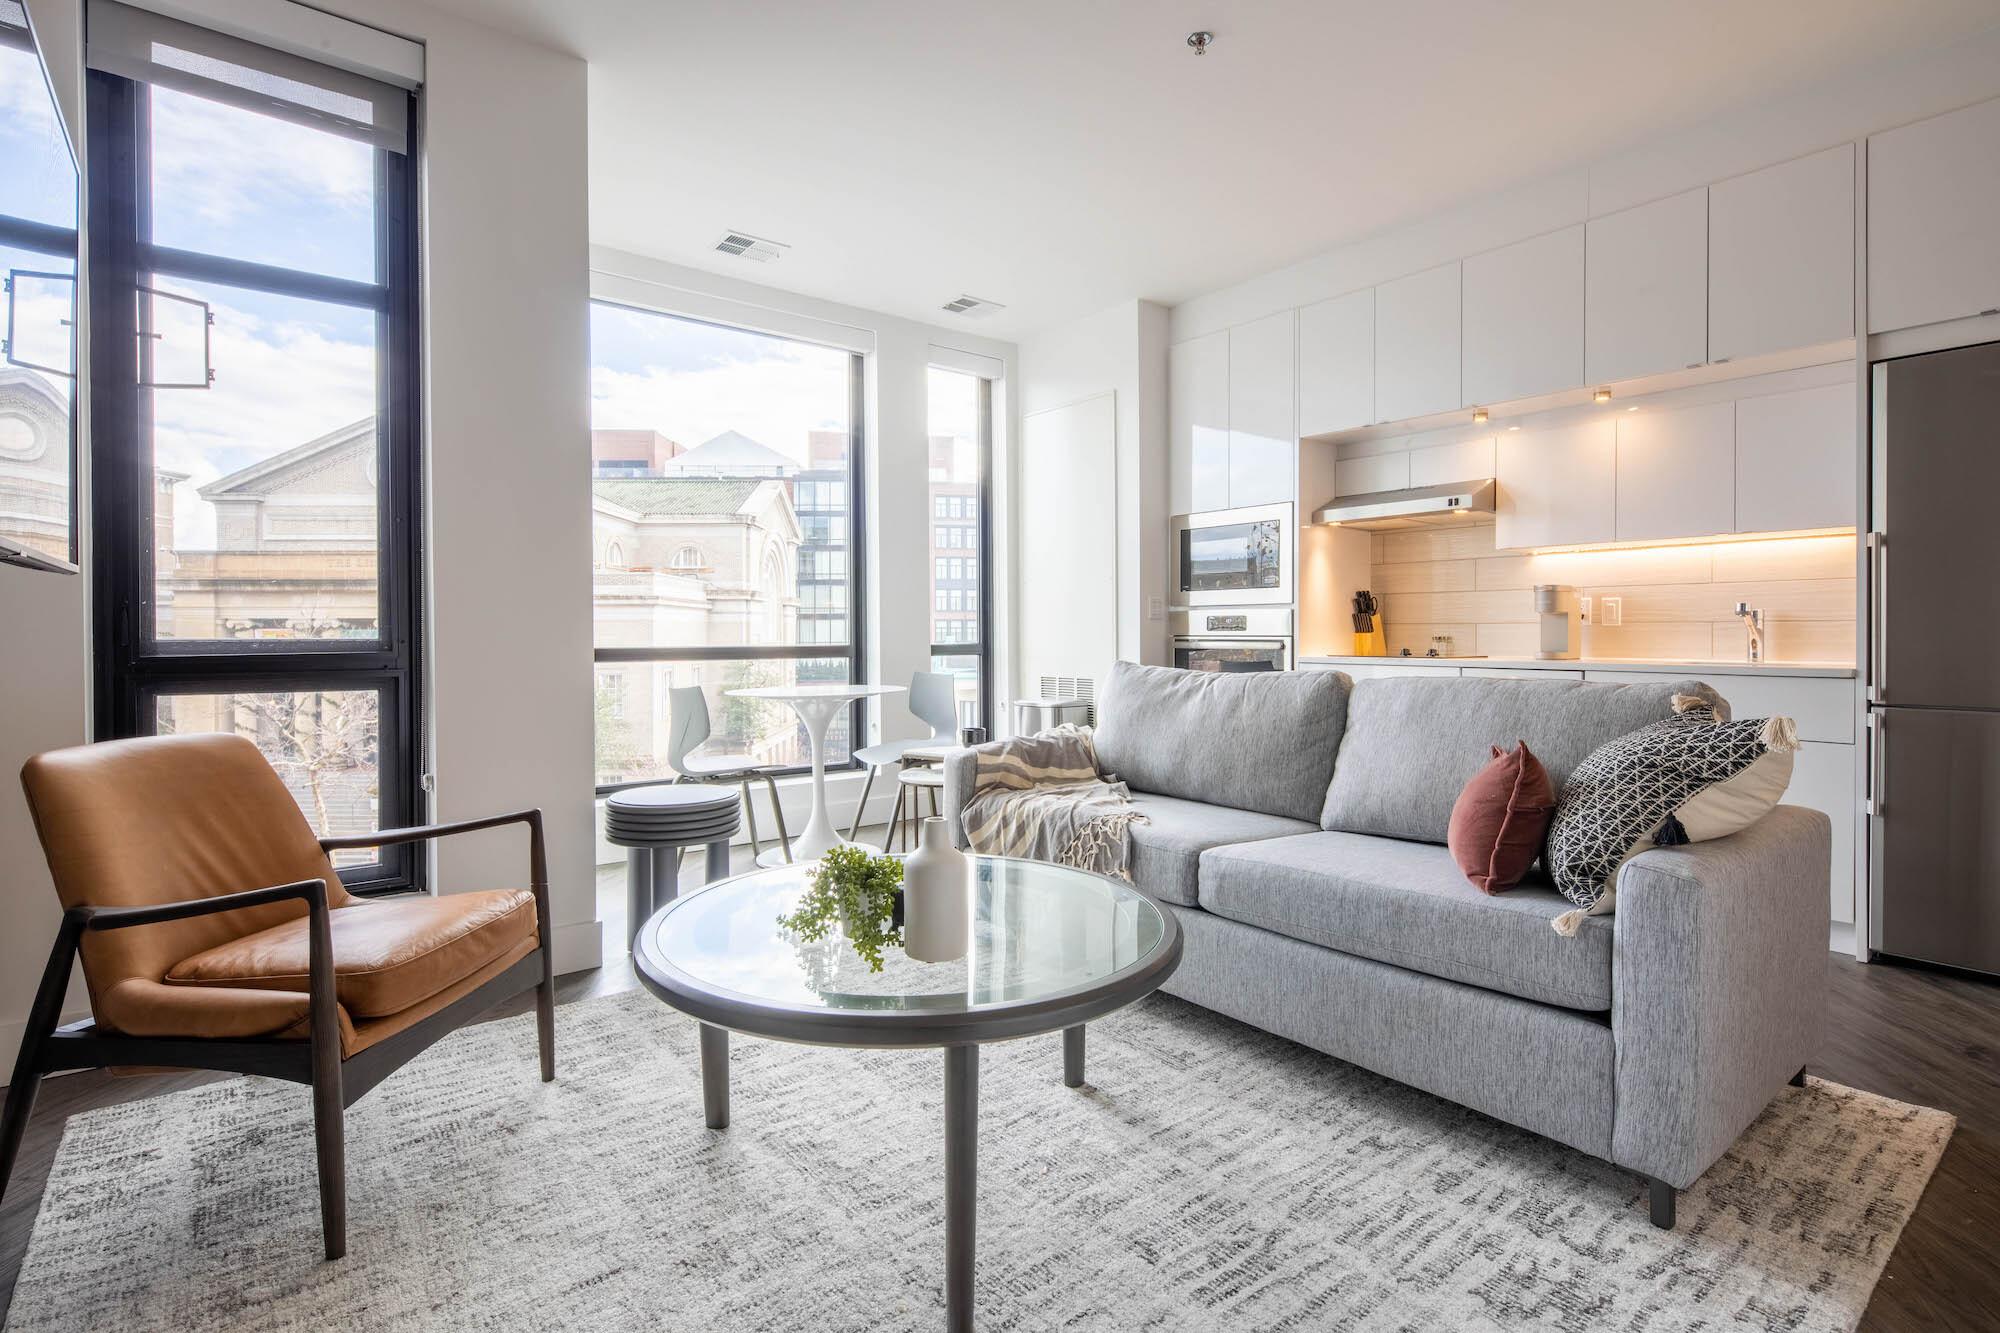 Landing apartment in Washington, D.C.